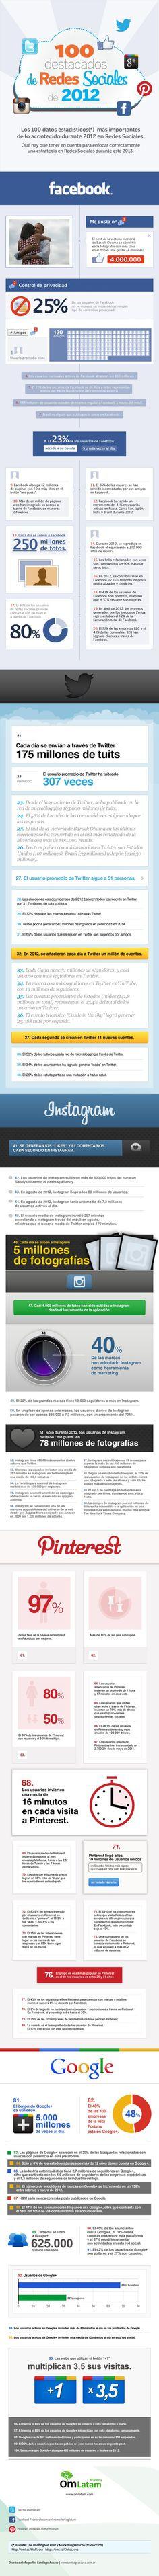 100 datos más importantes de Redes Sociales en 2012 #infografia #infographic #socialmedia